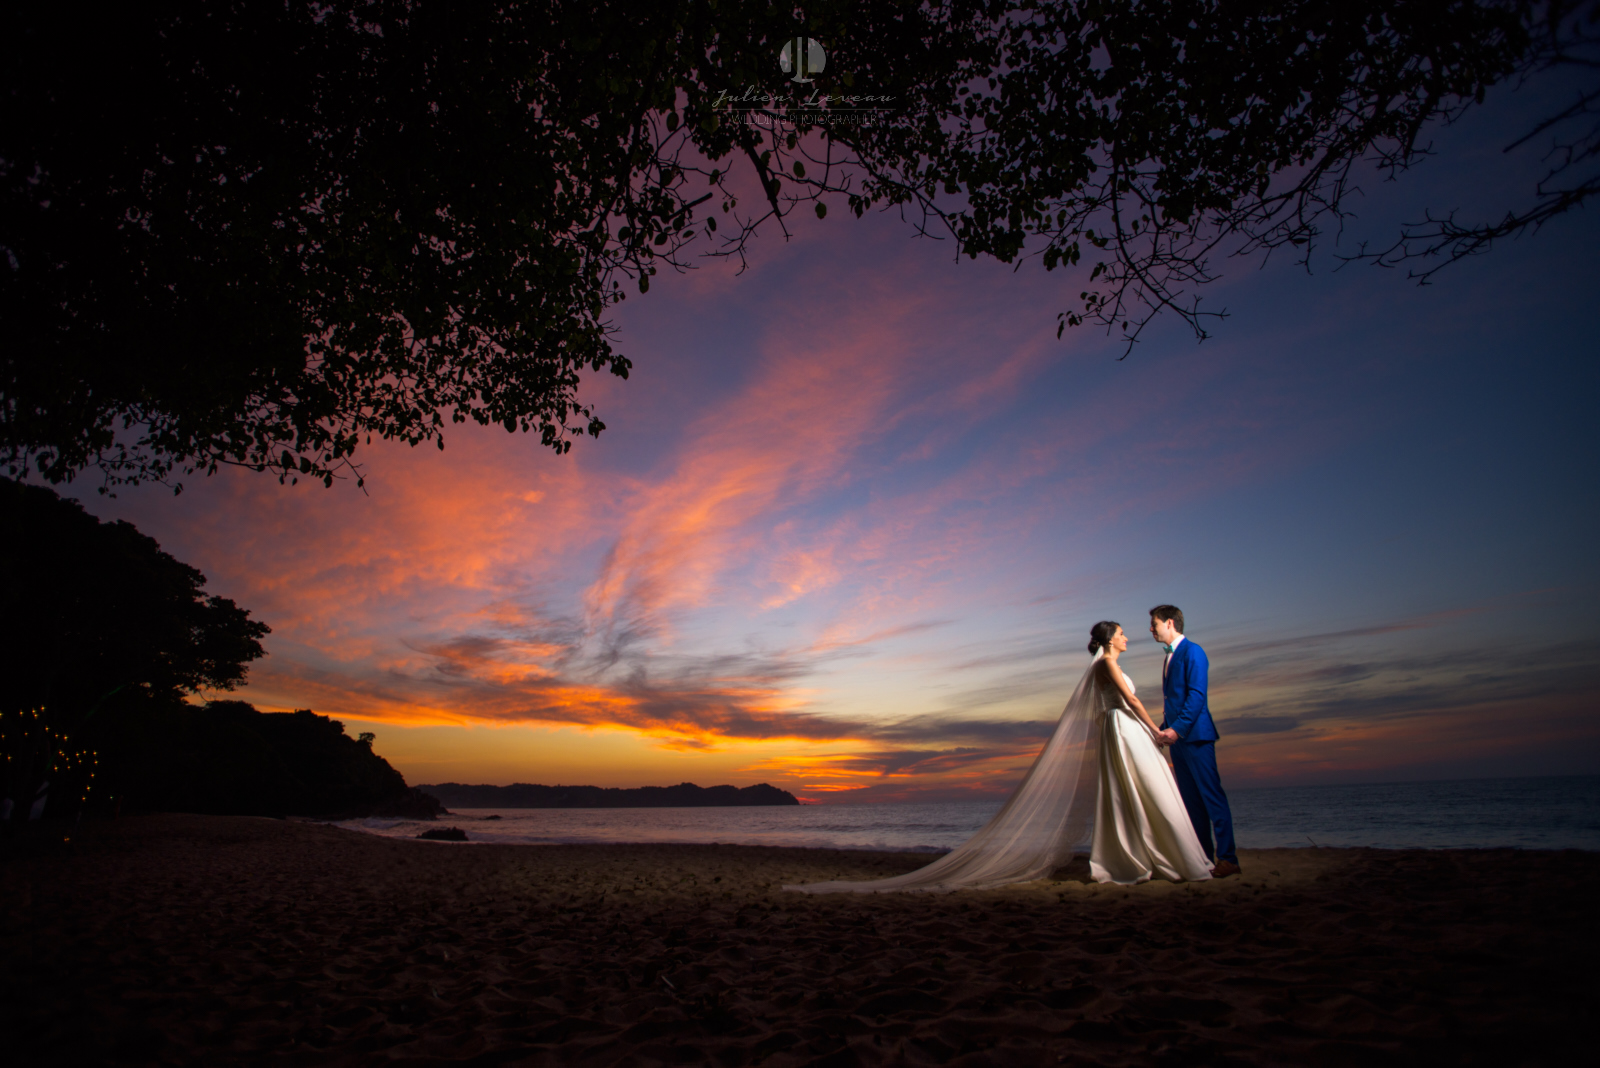 Wedding Photographer in San Pancho Nayarit - Beautiful sunset on the beach